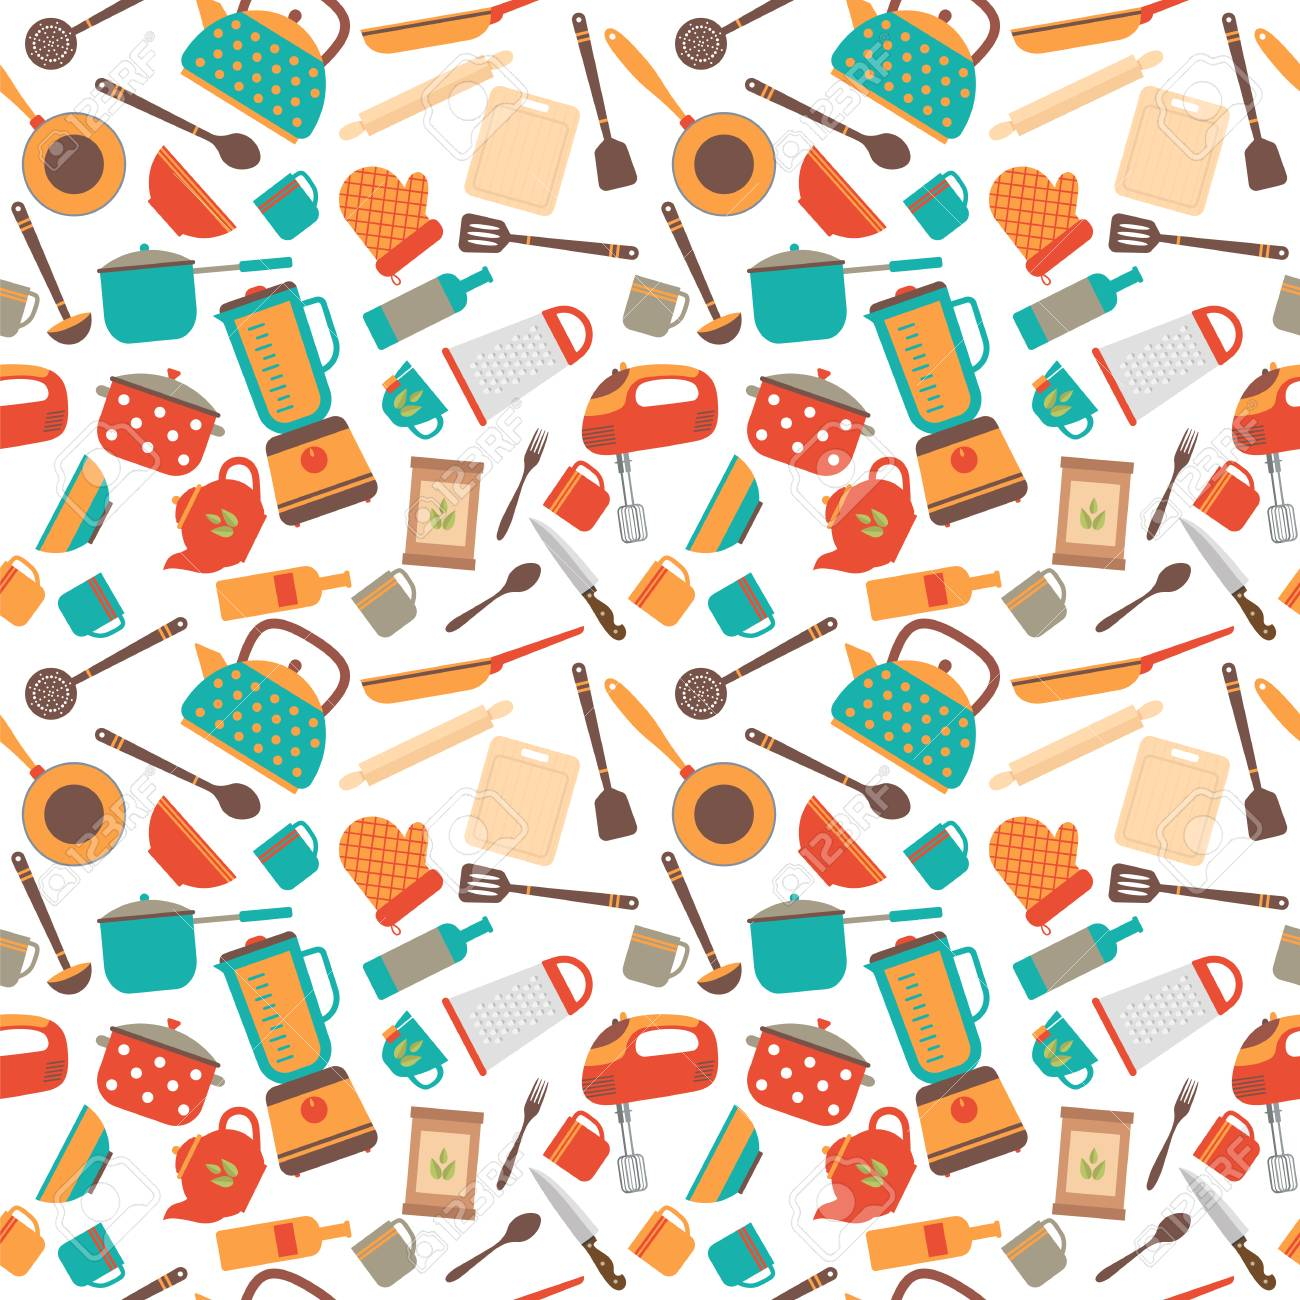 kitchen utensils background clipart cooking utensils background cute seamless pattern with kitchen tools vector illustration stock utensils background seamless pattern with kitchen